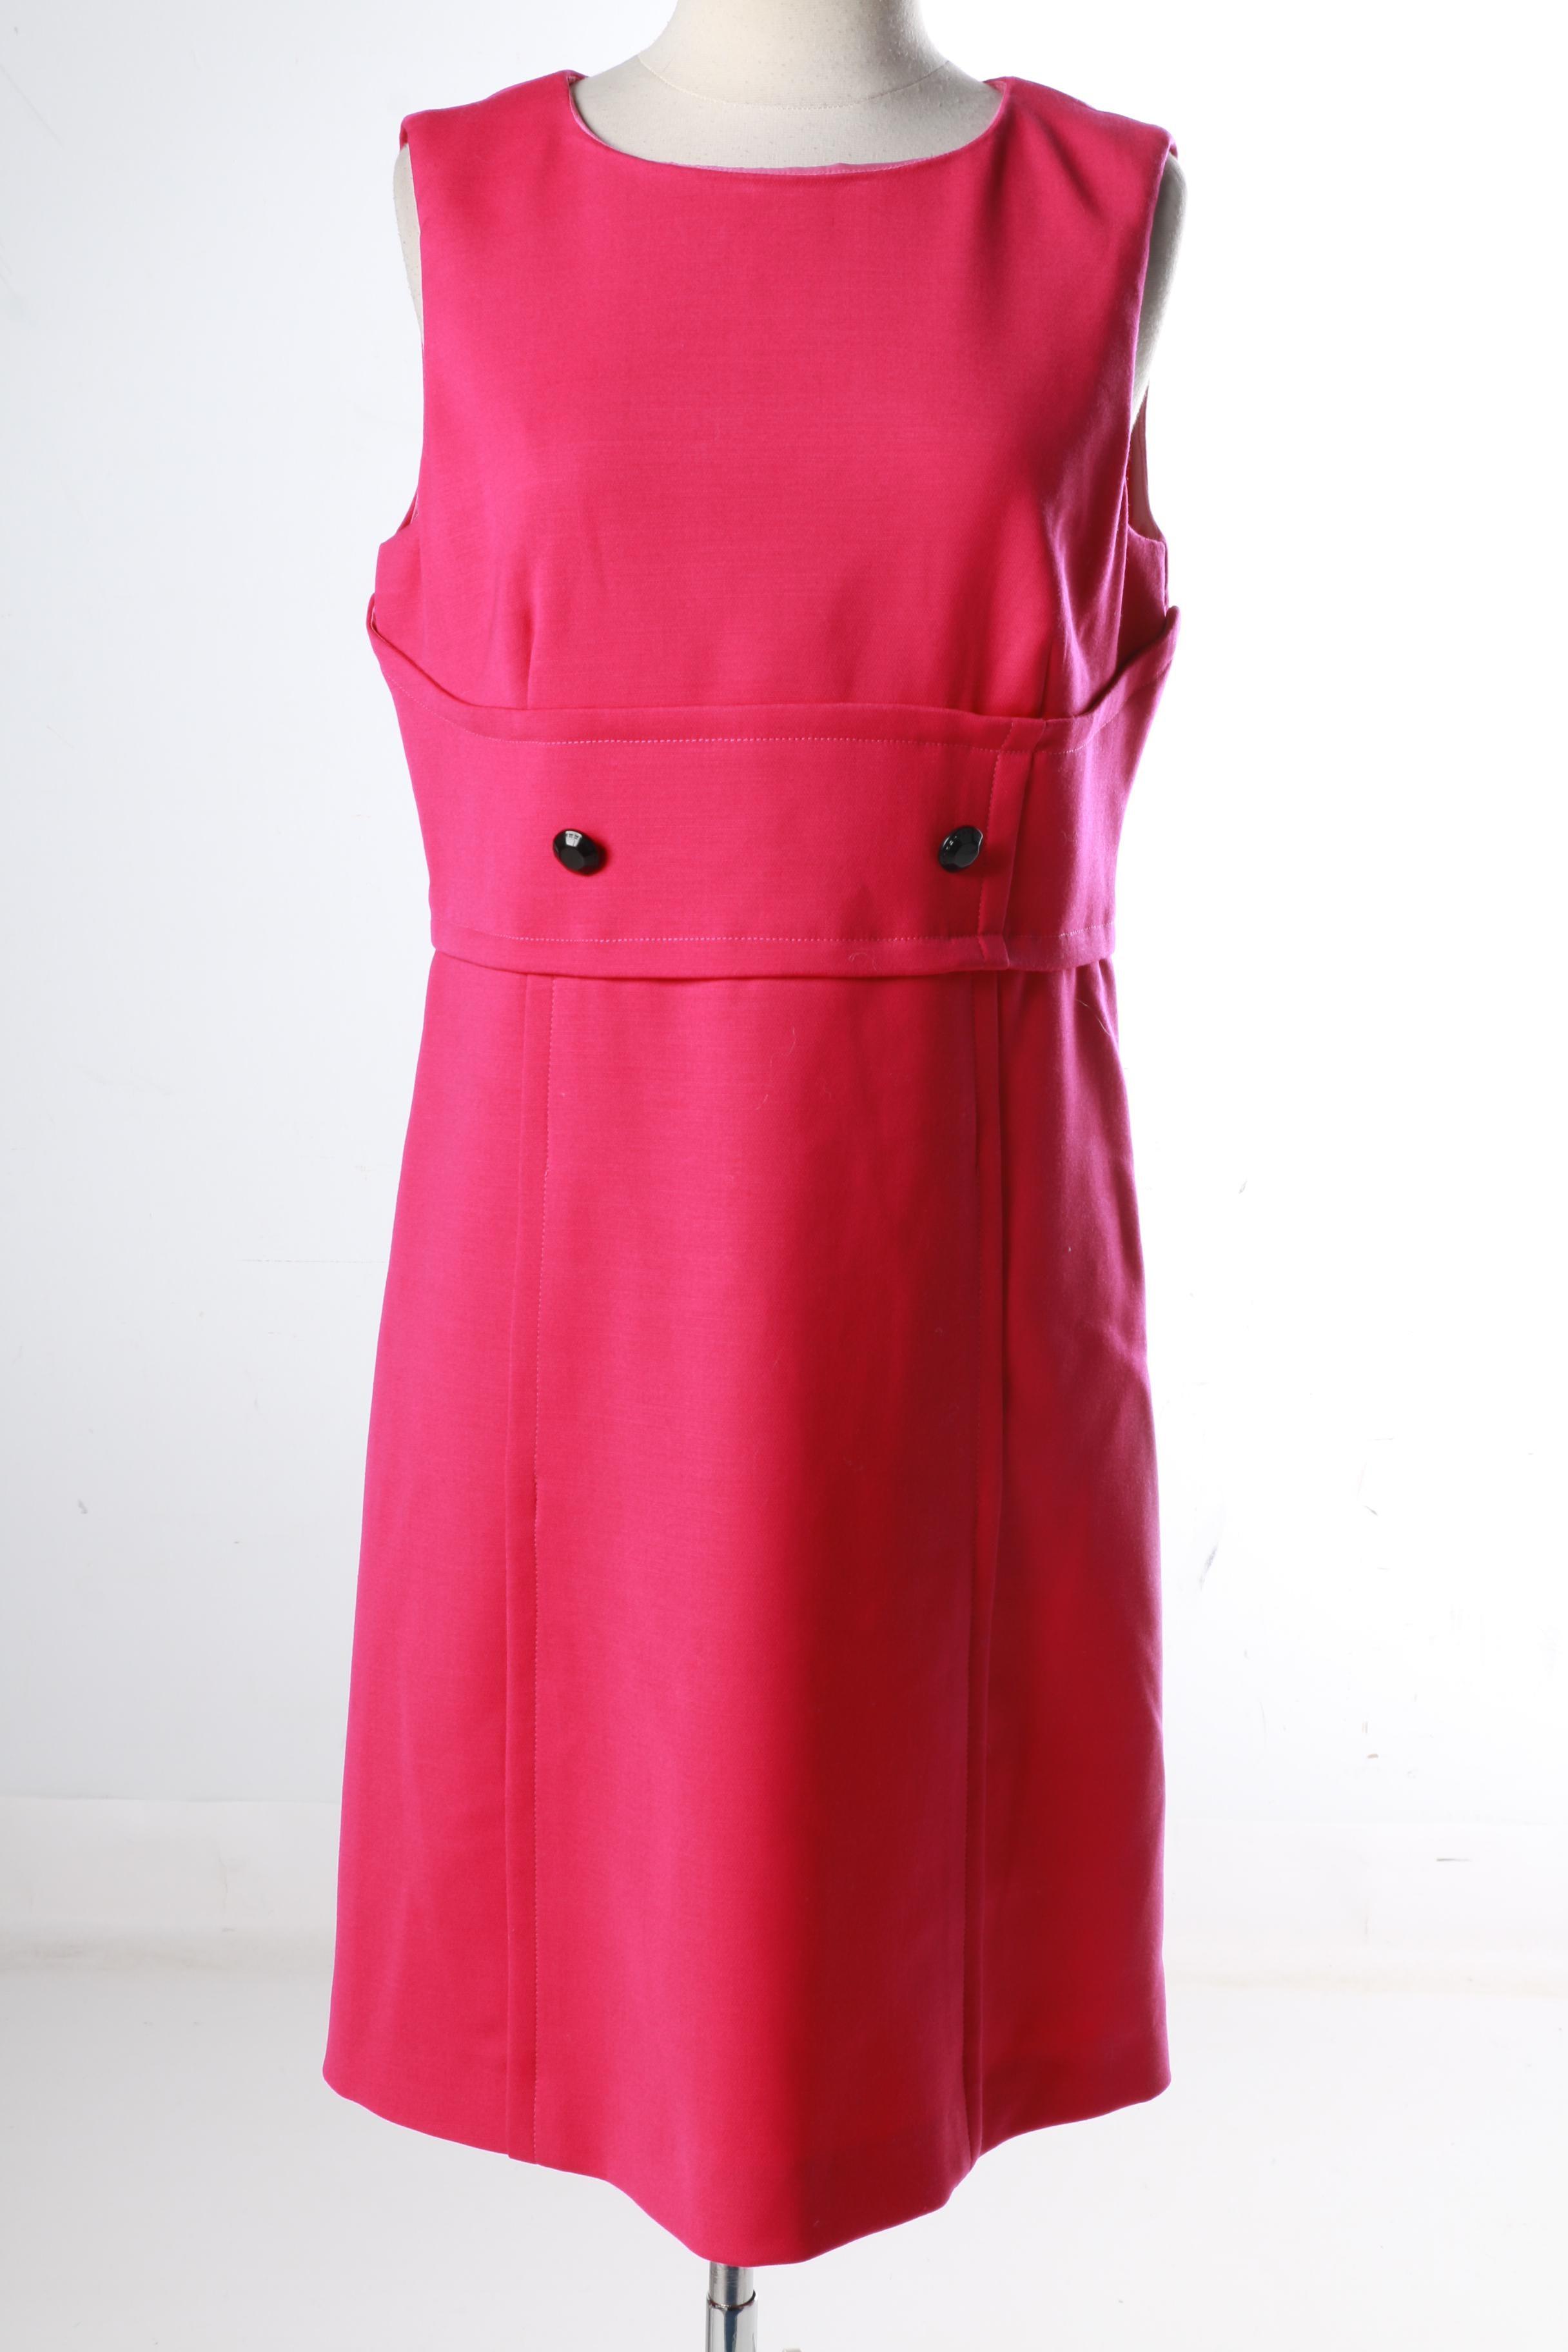 R.E.D Valentino Dress